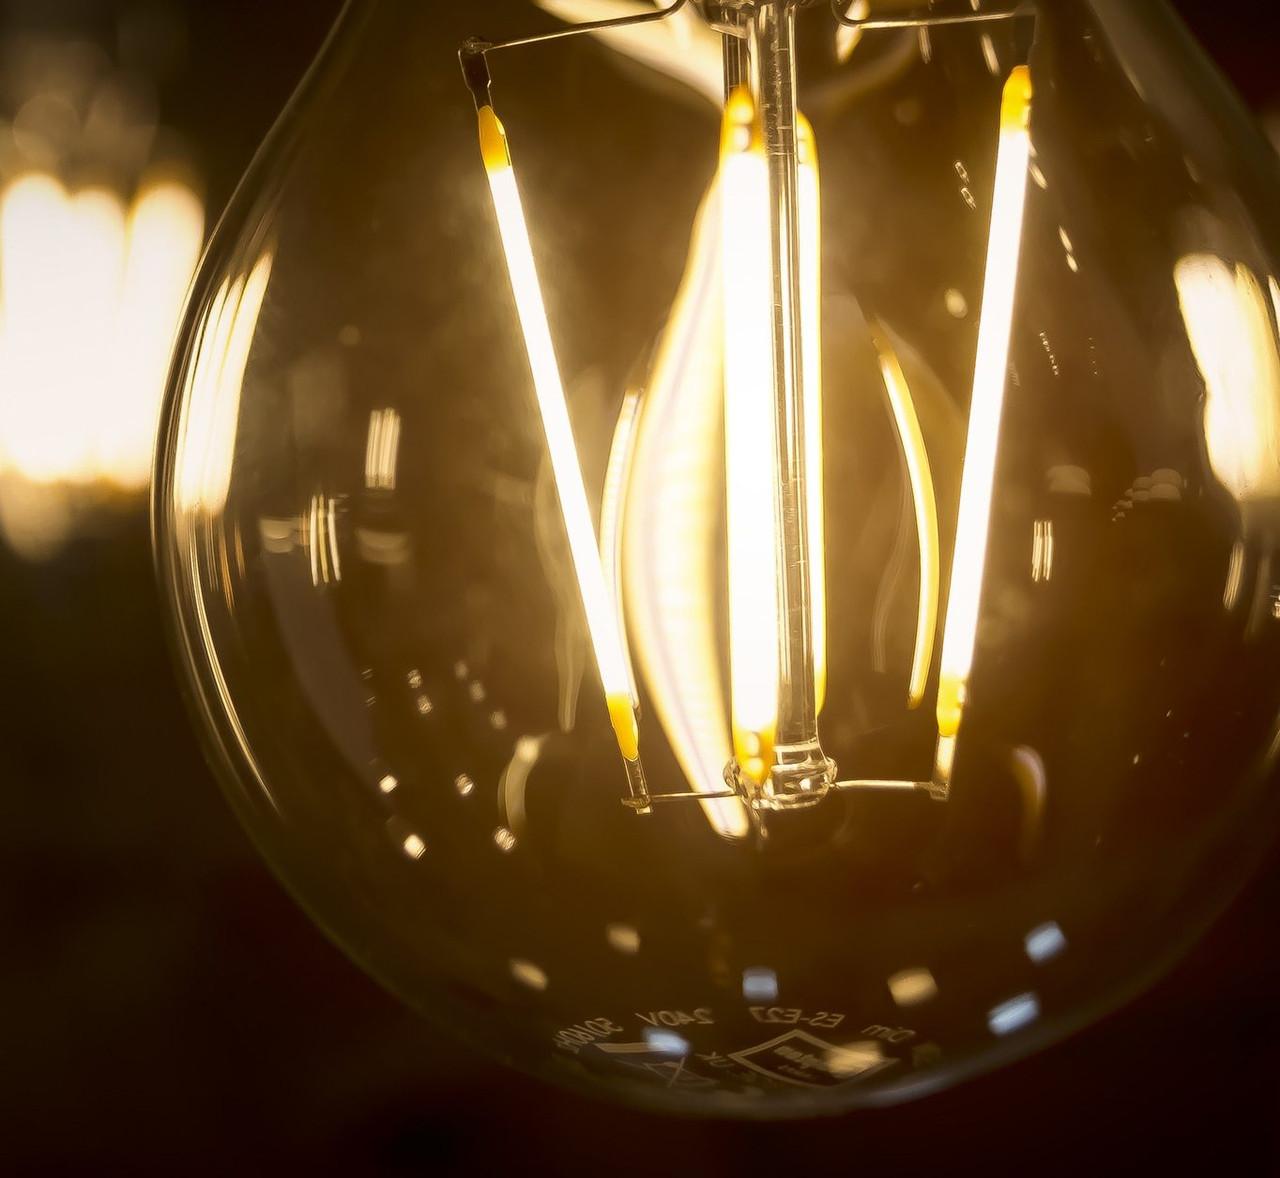 LED GLS 15W Equivalent Light Bulbs